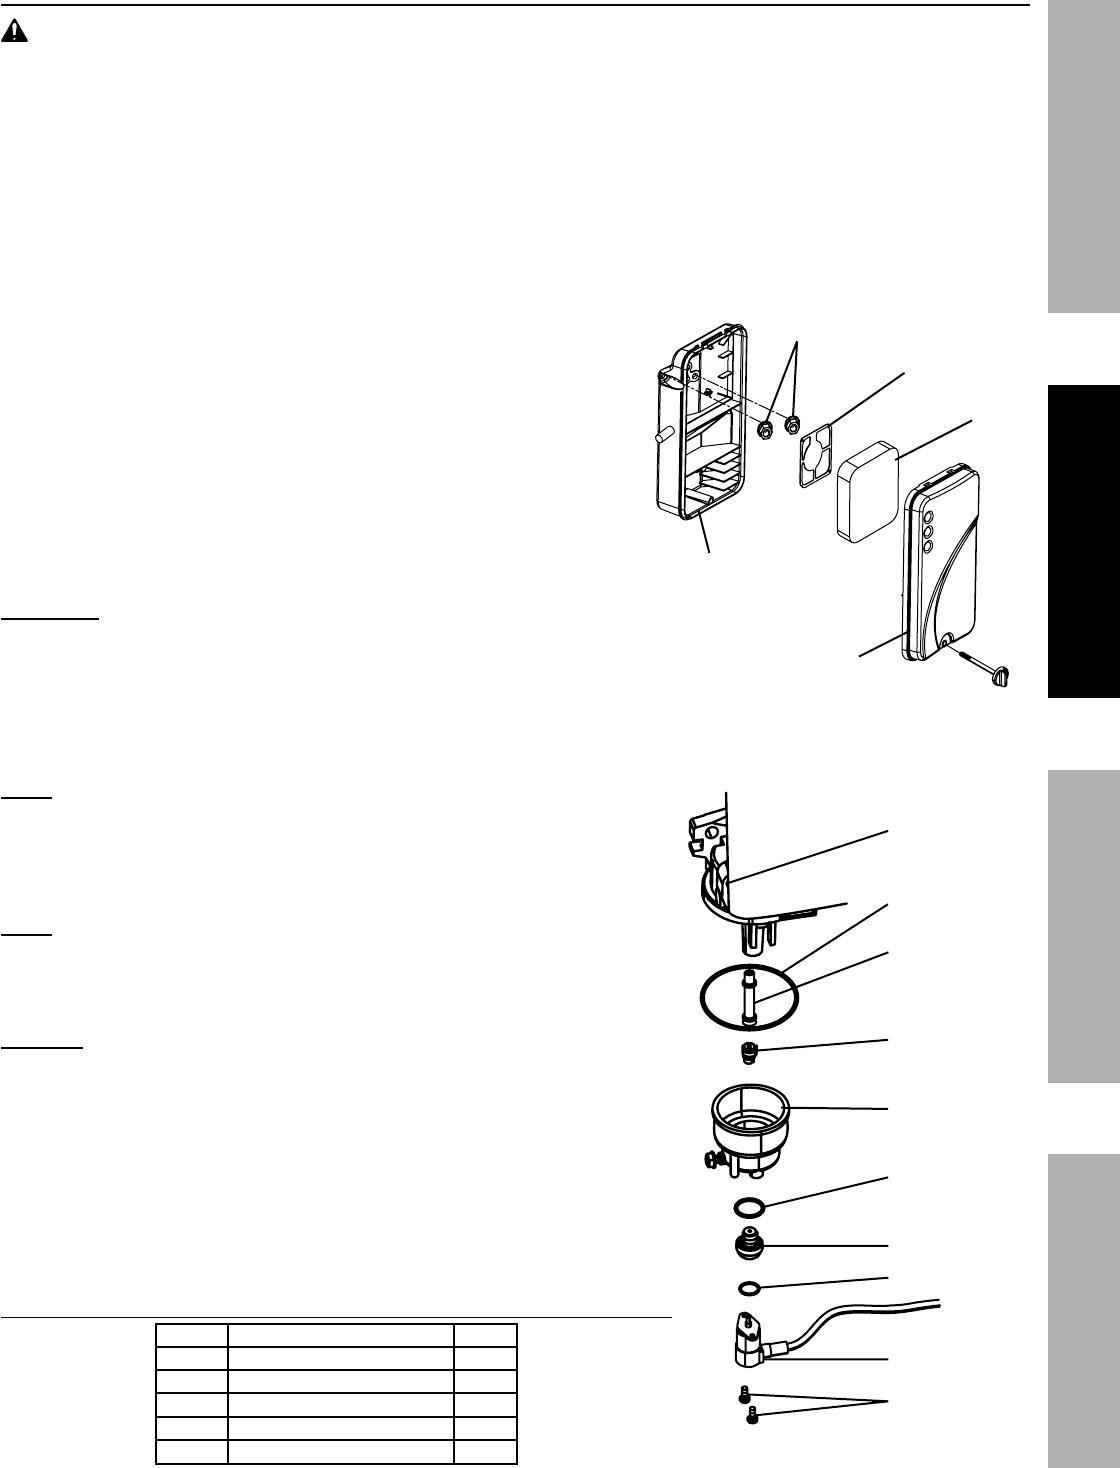 Manual For The 63083 6500 Peak/5500 Running Watts, 13 HP